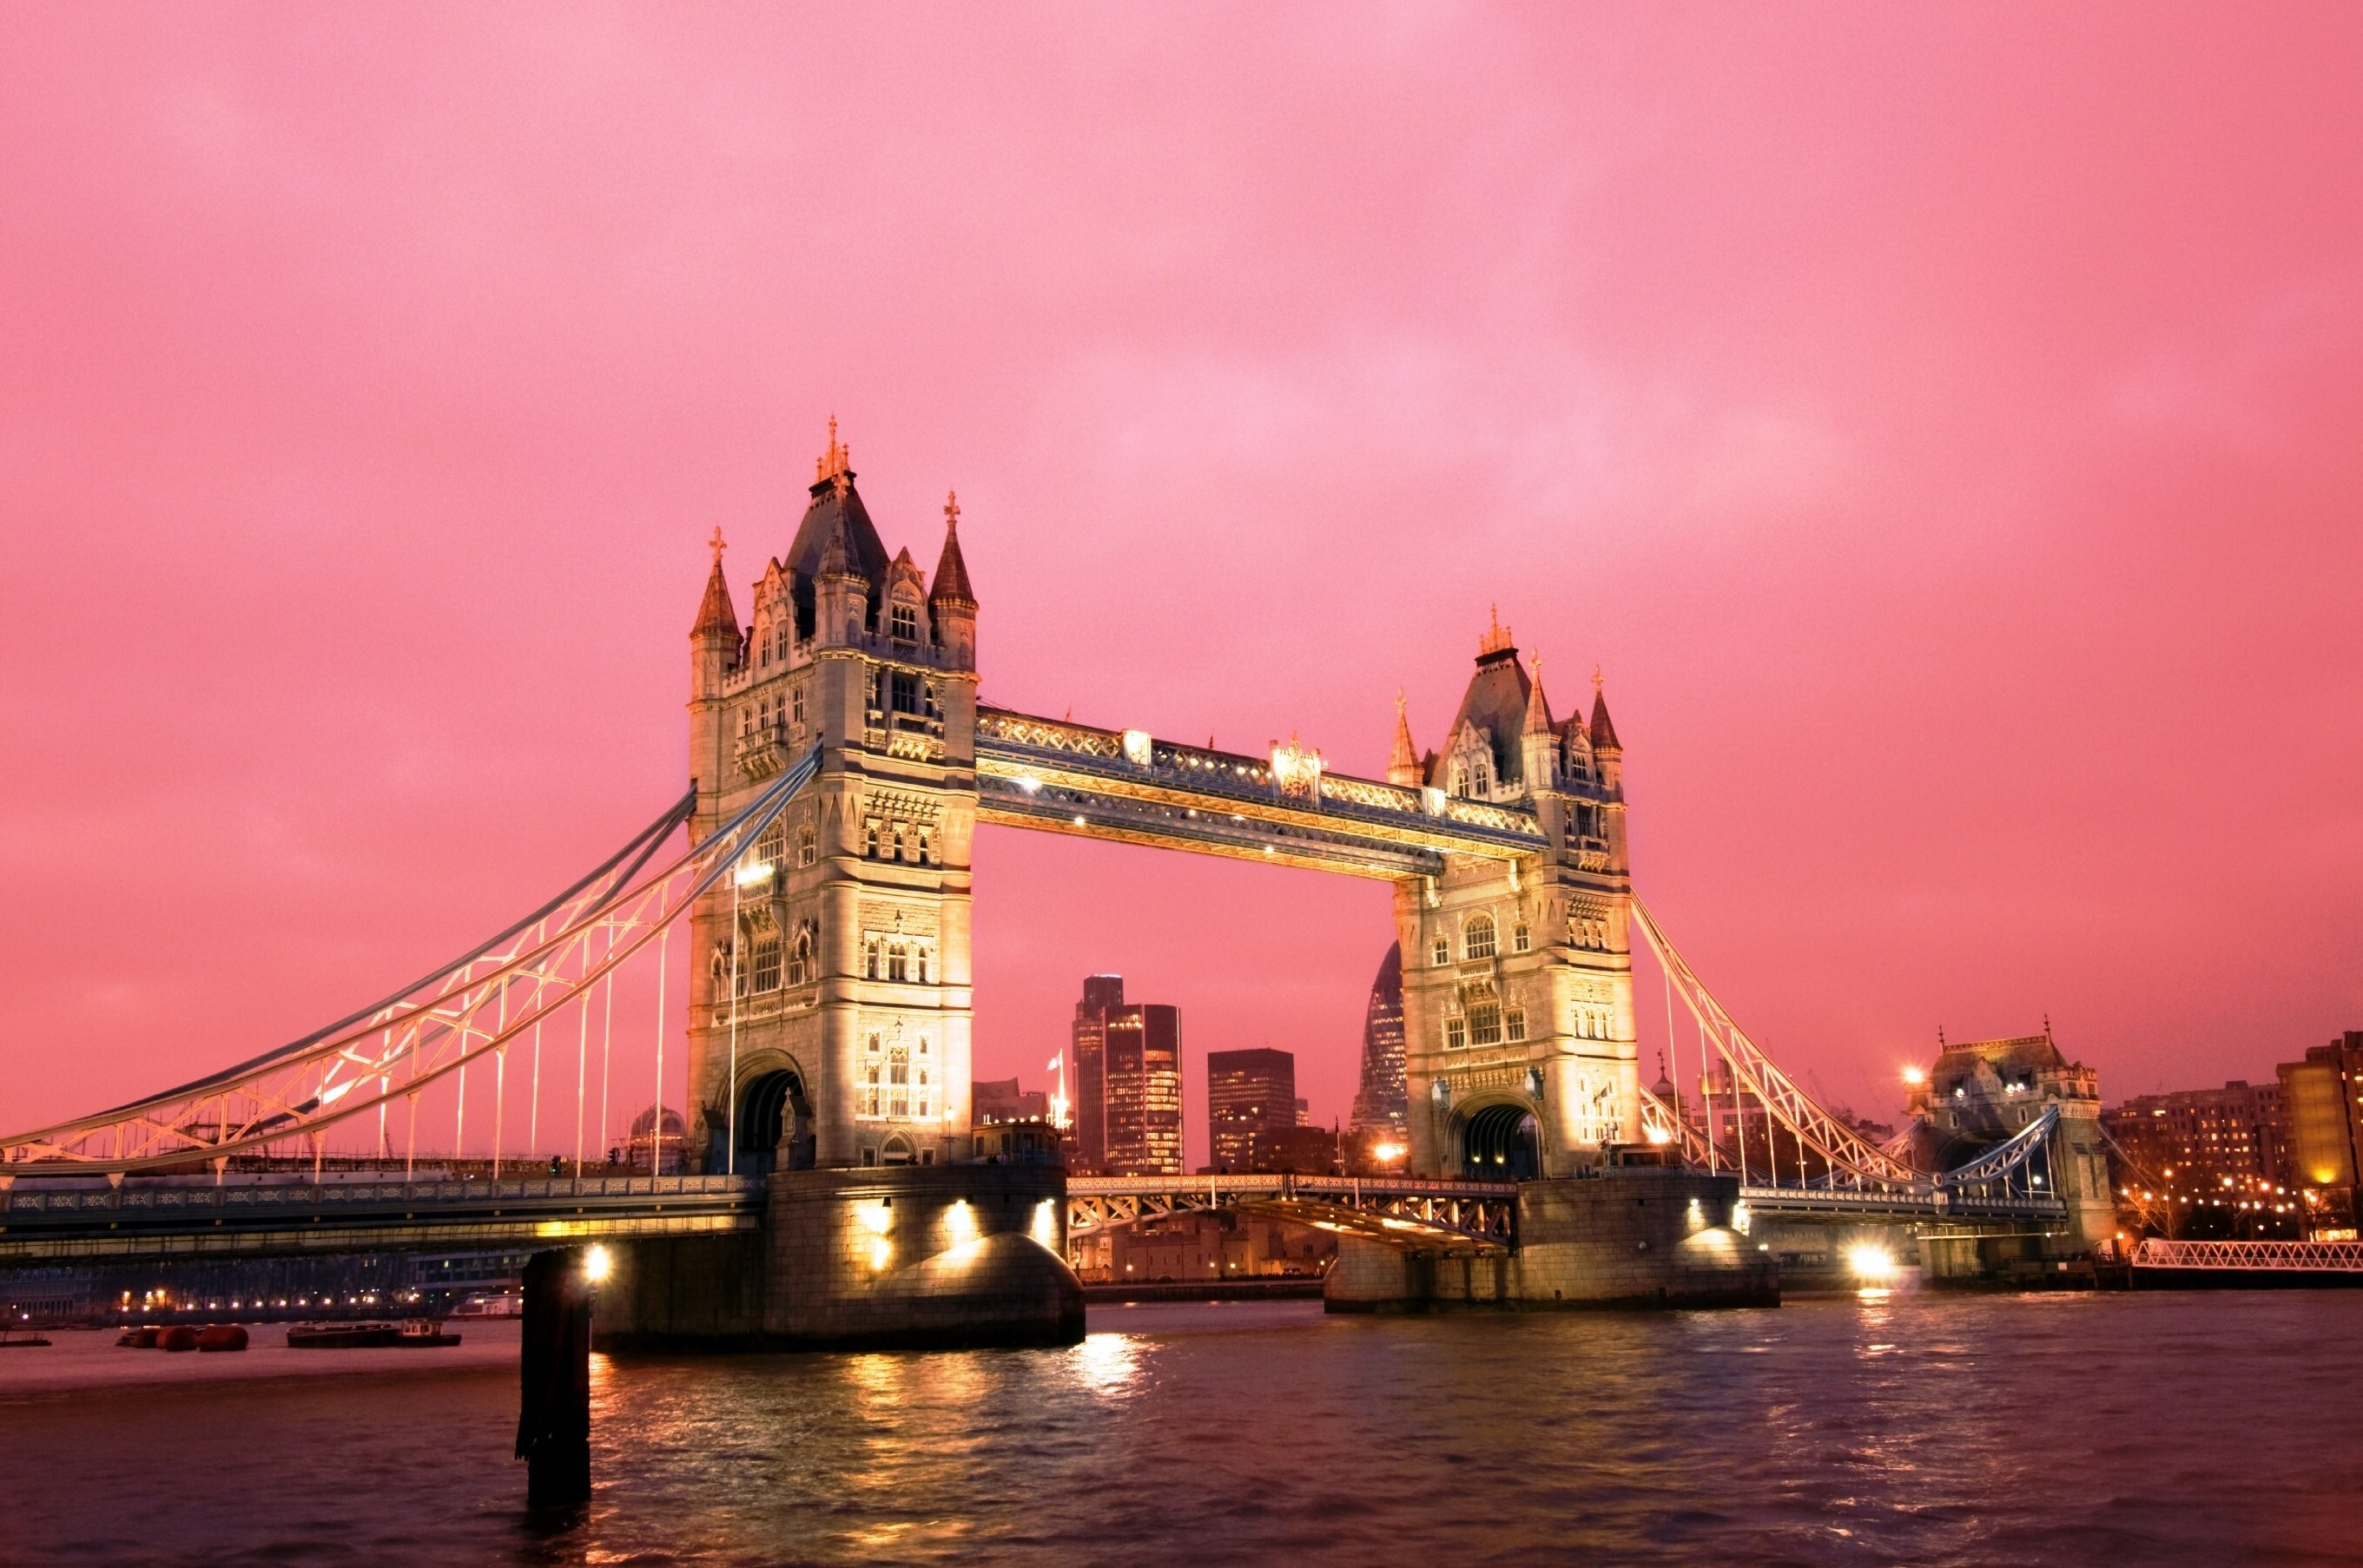 Elegant night view of tower bridge in uk hd wallpapers - Bridge wallpaper hd ...